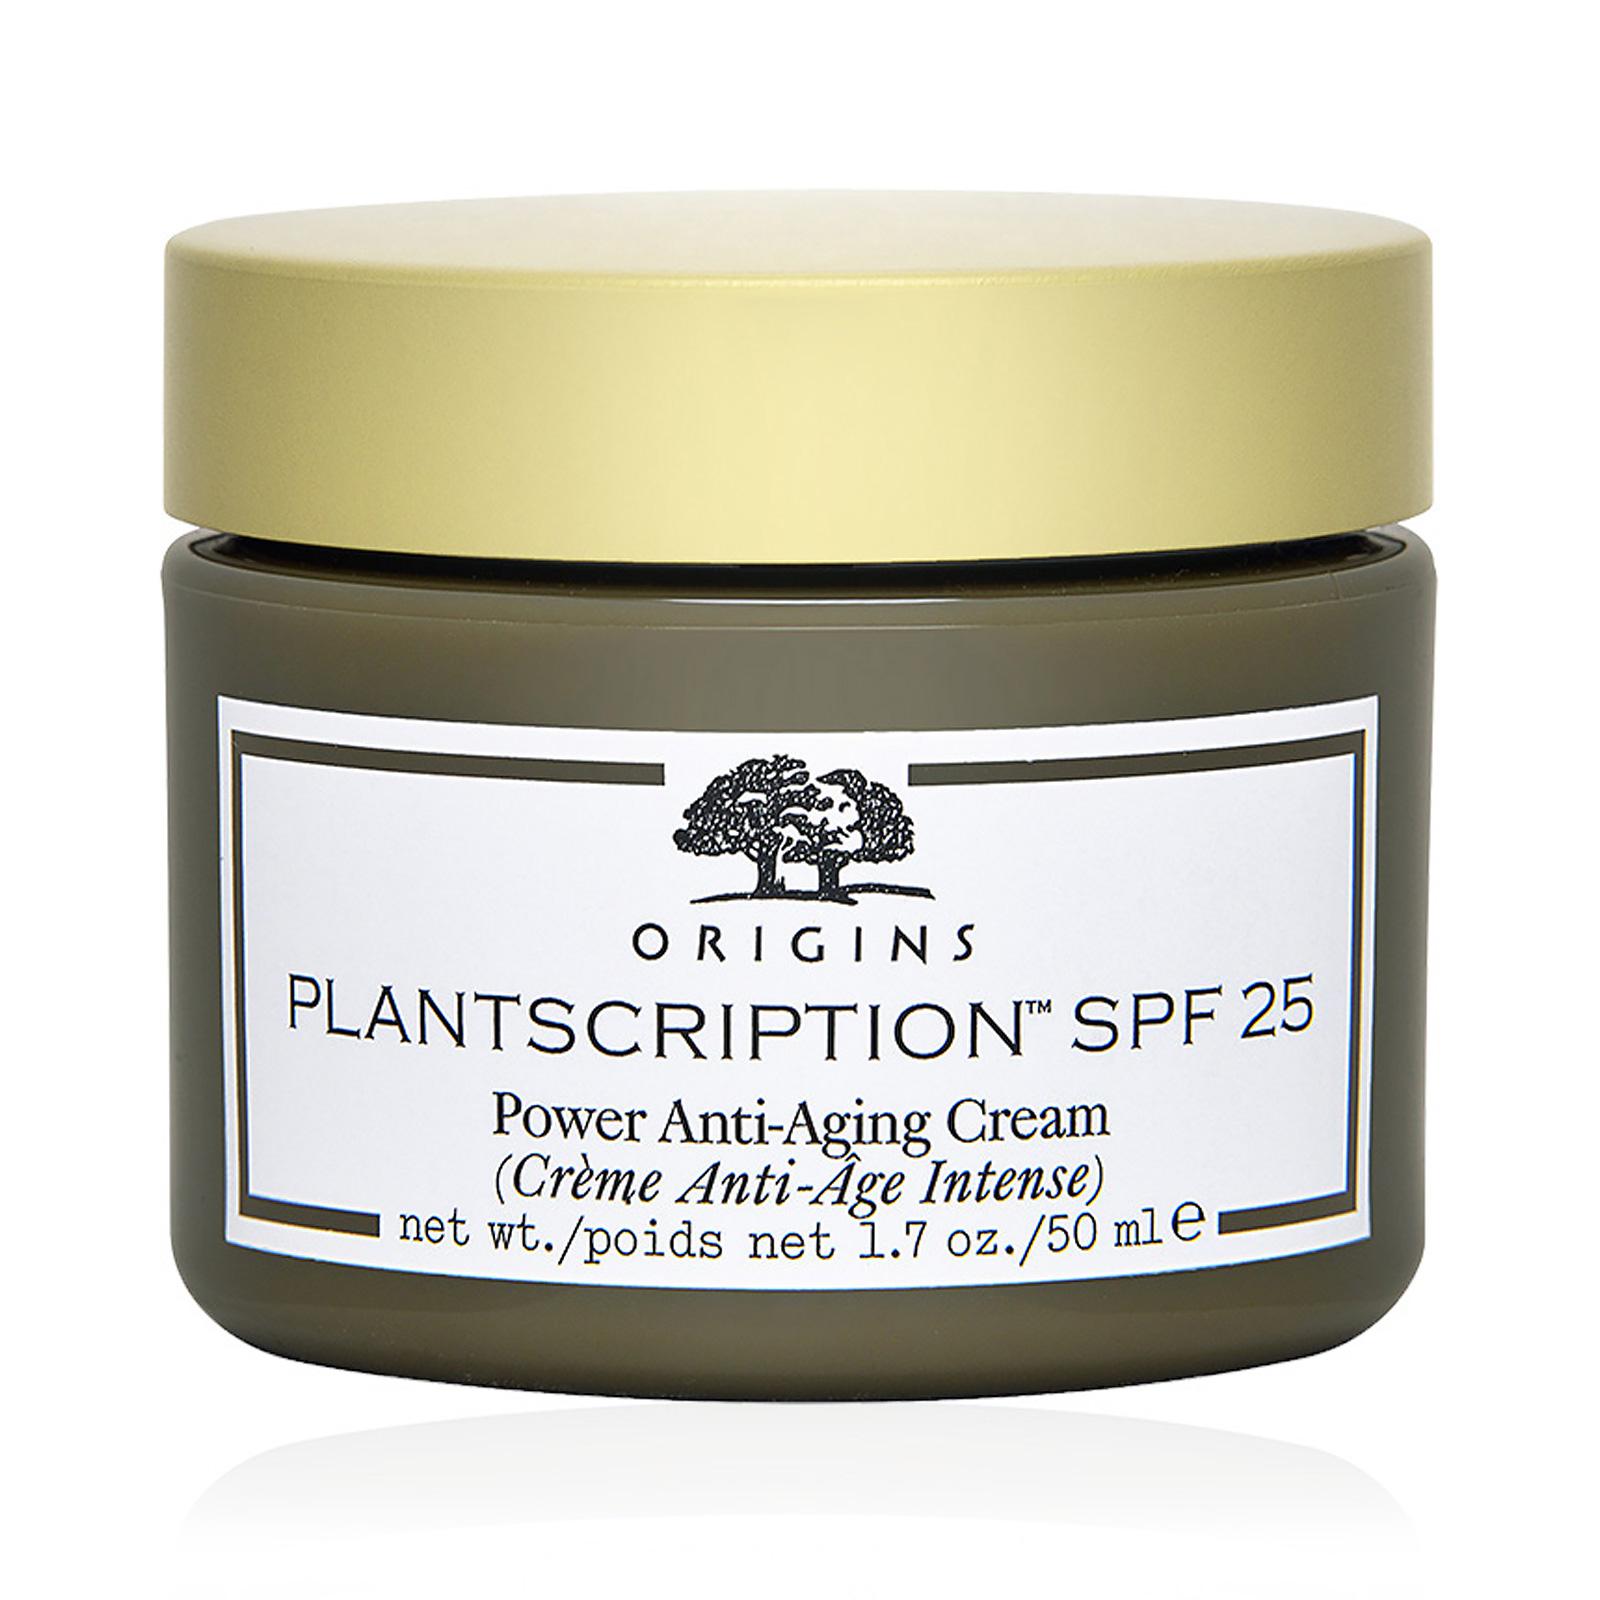 Plantscription SPF25 Power Anti-Aging Cream